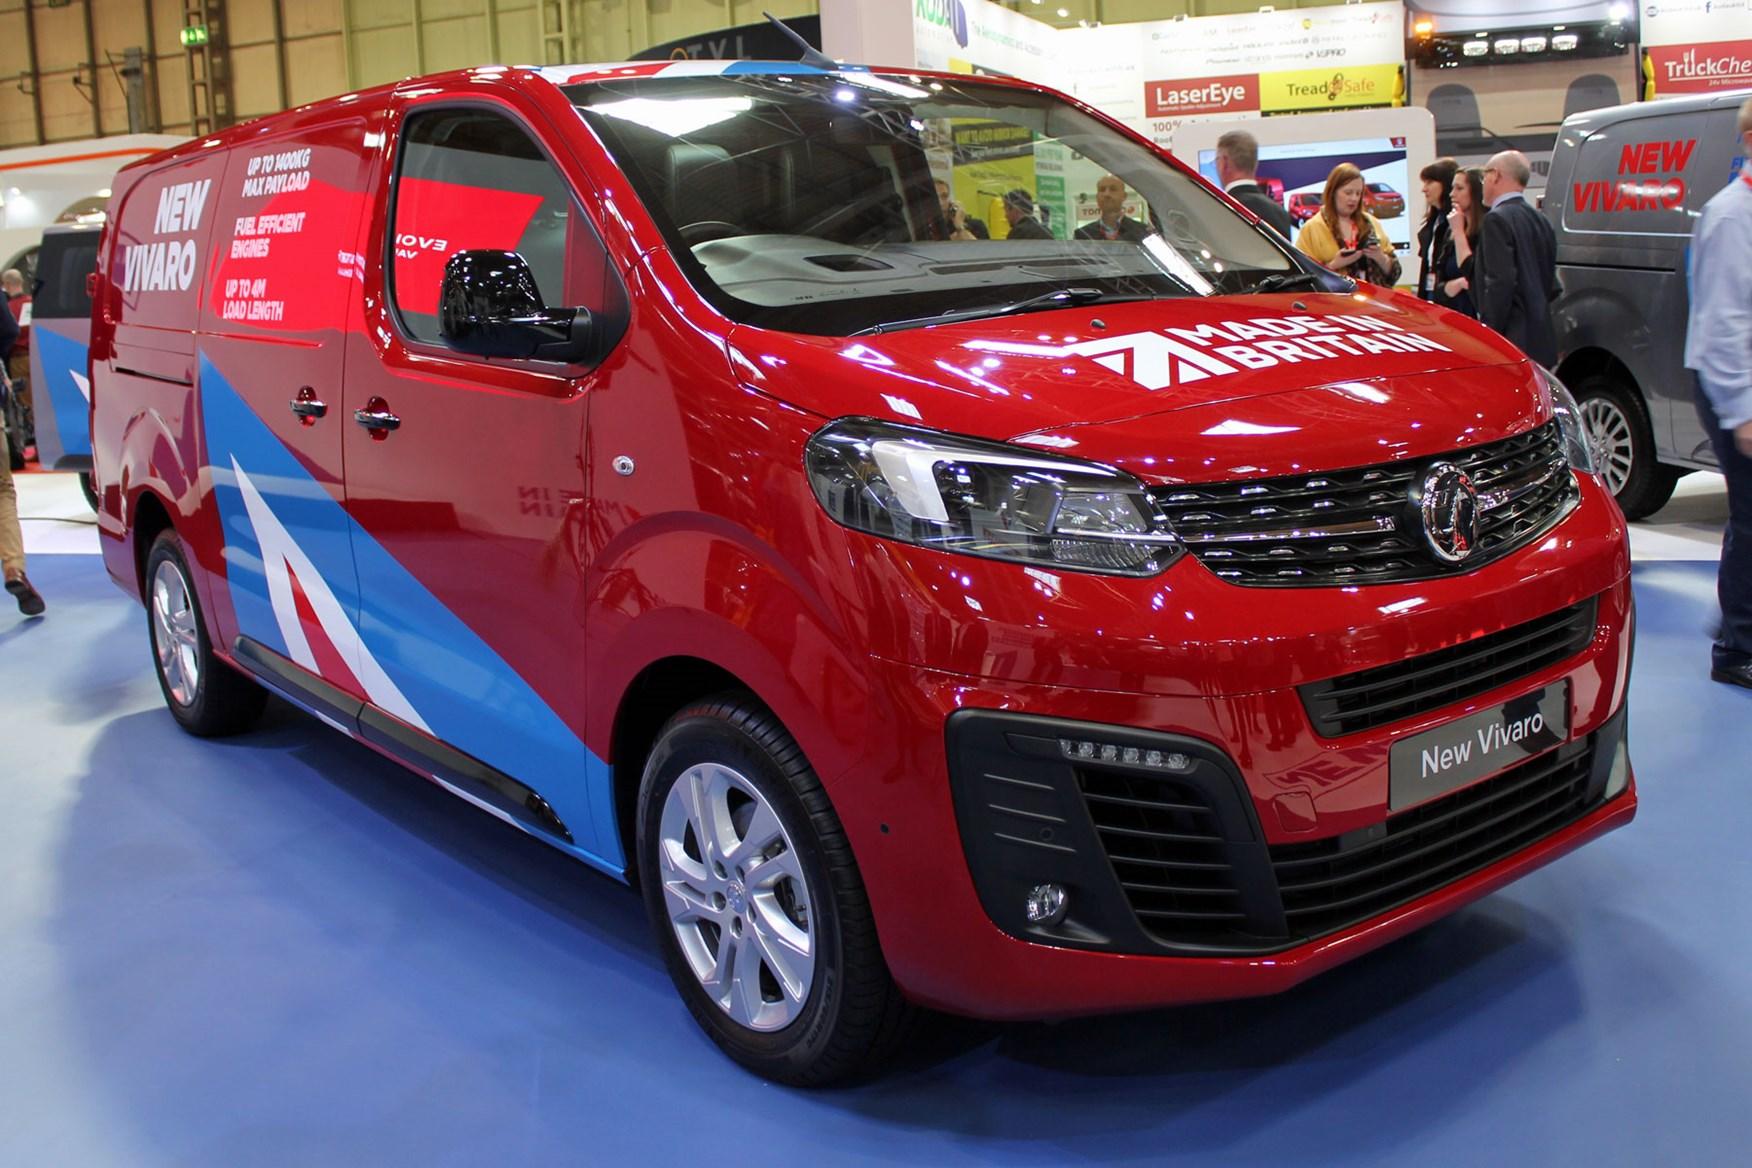 All New Vauxhall Vivaro Makes Public Debut At Cv Show 2019 Parkers